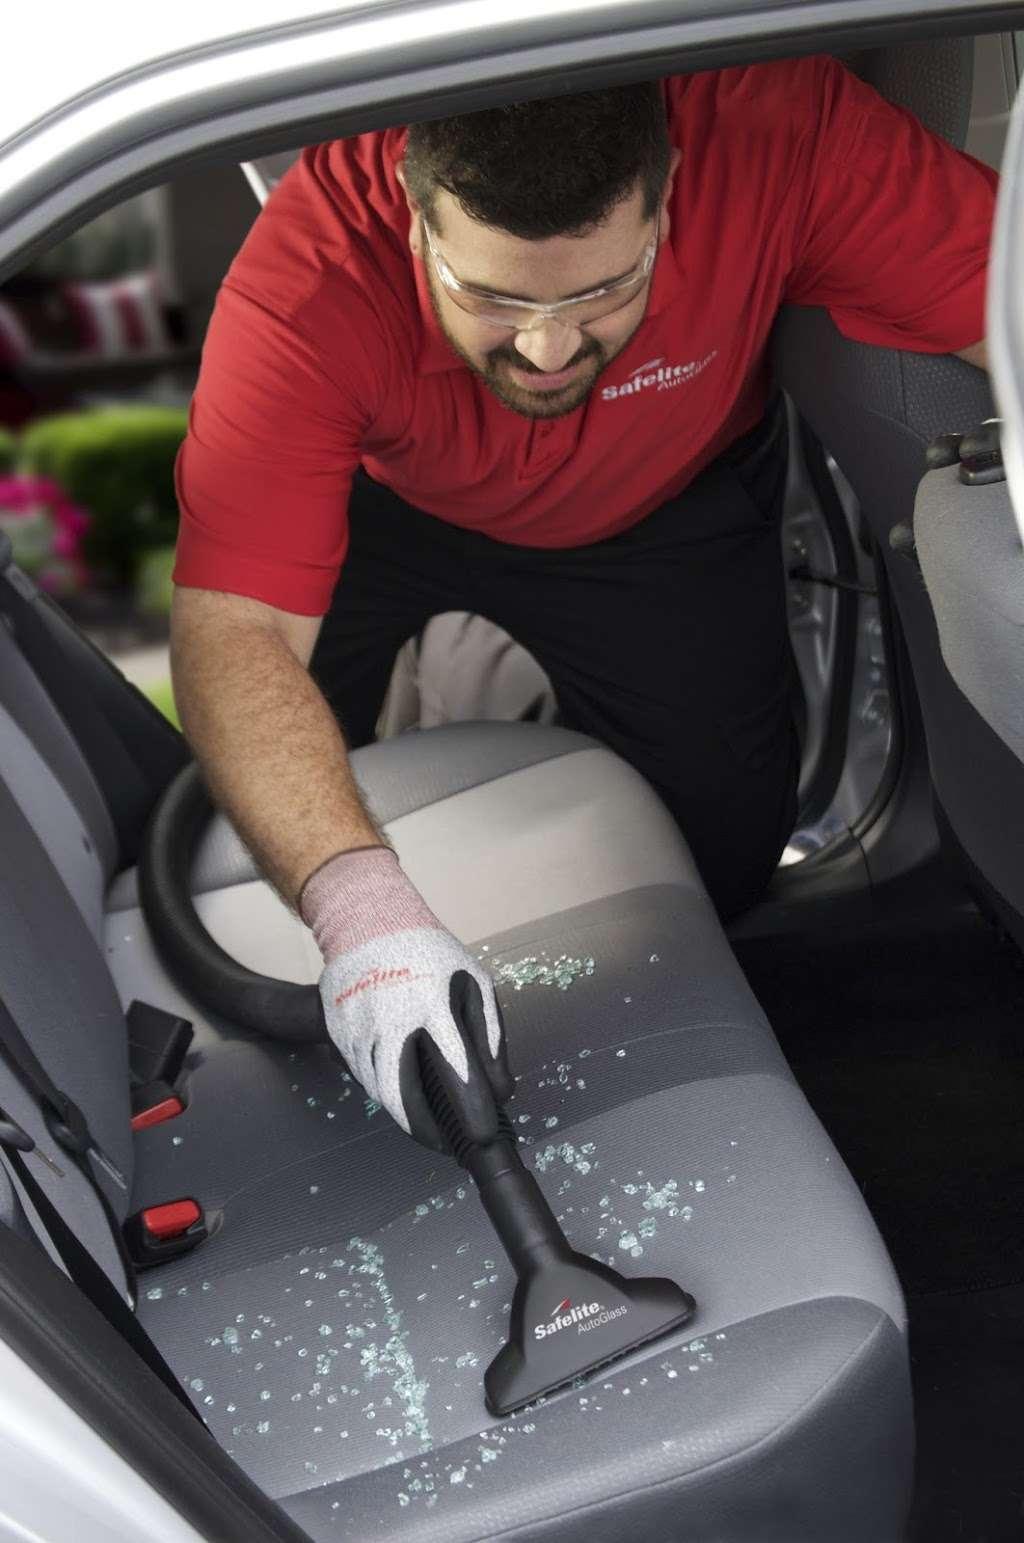 Safelite AutoGlass - car repair  | Photo 6 of 6 | Address: 1761 Columbia Ave, Lancaster, PA 17603, USA | Phone: (717) 925-8830